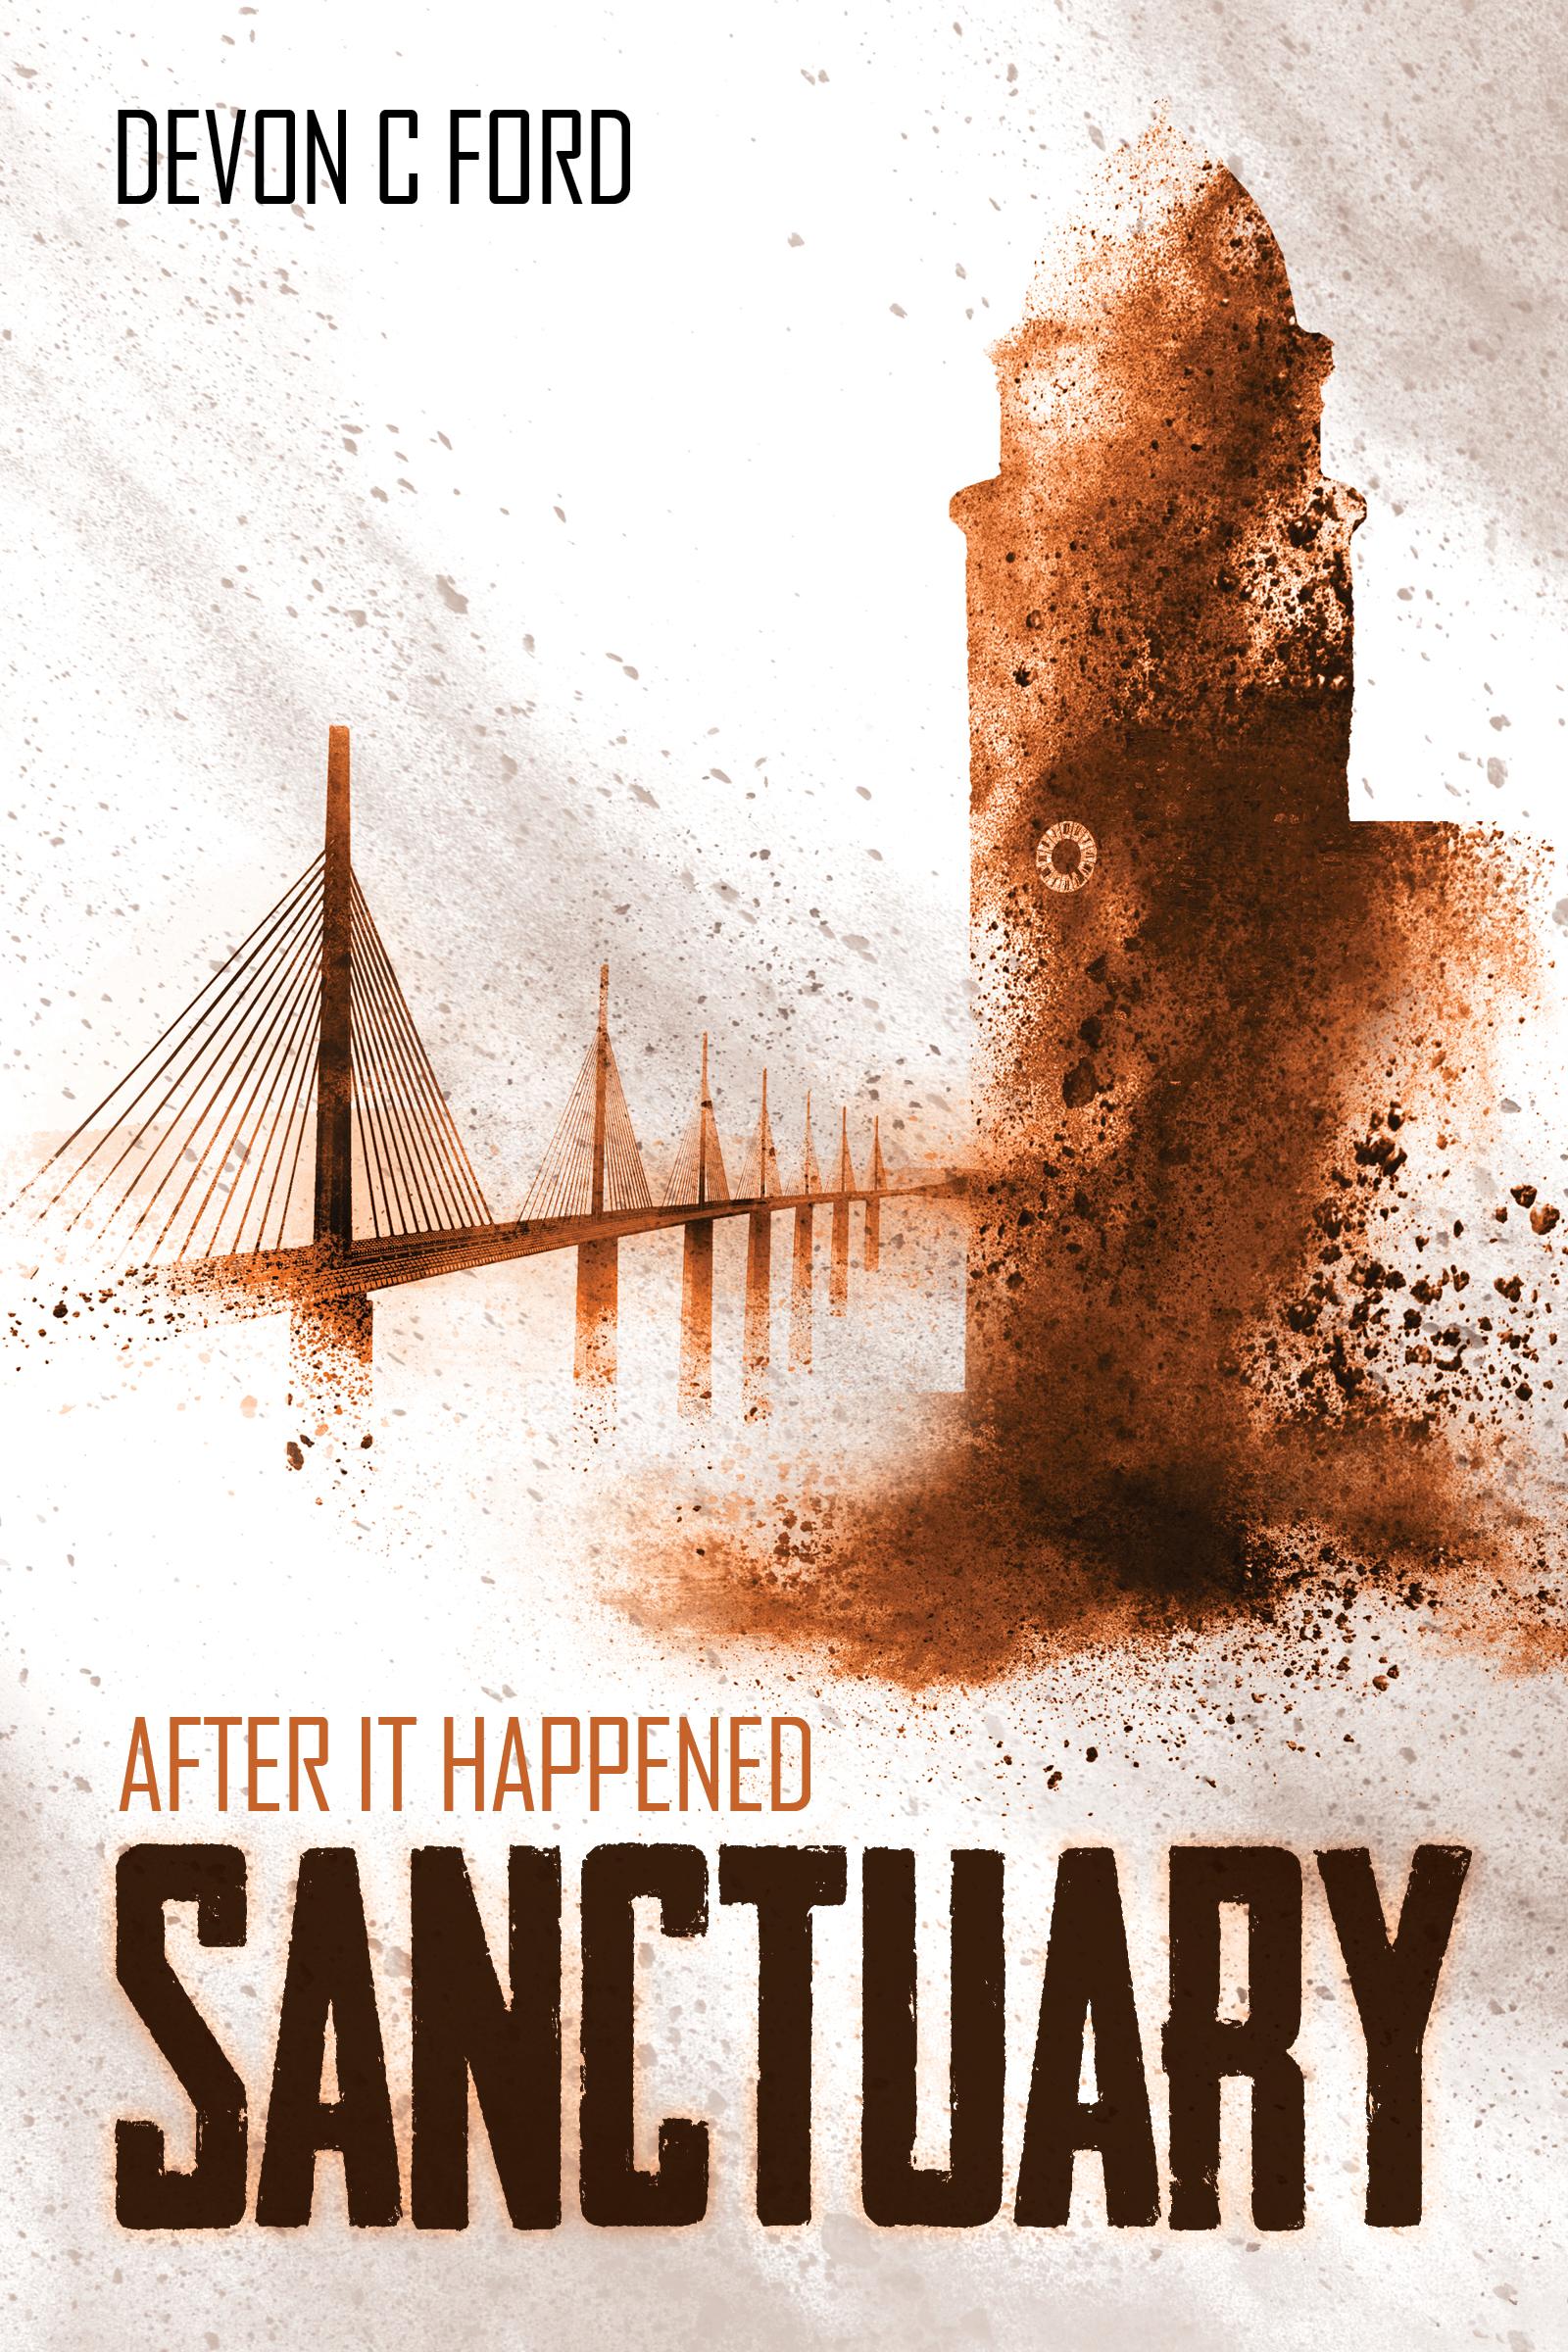 Book 5 Sanctuary - Ebook.jpg